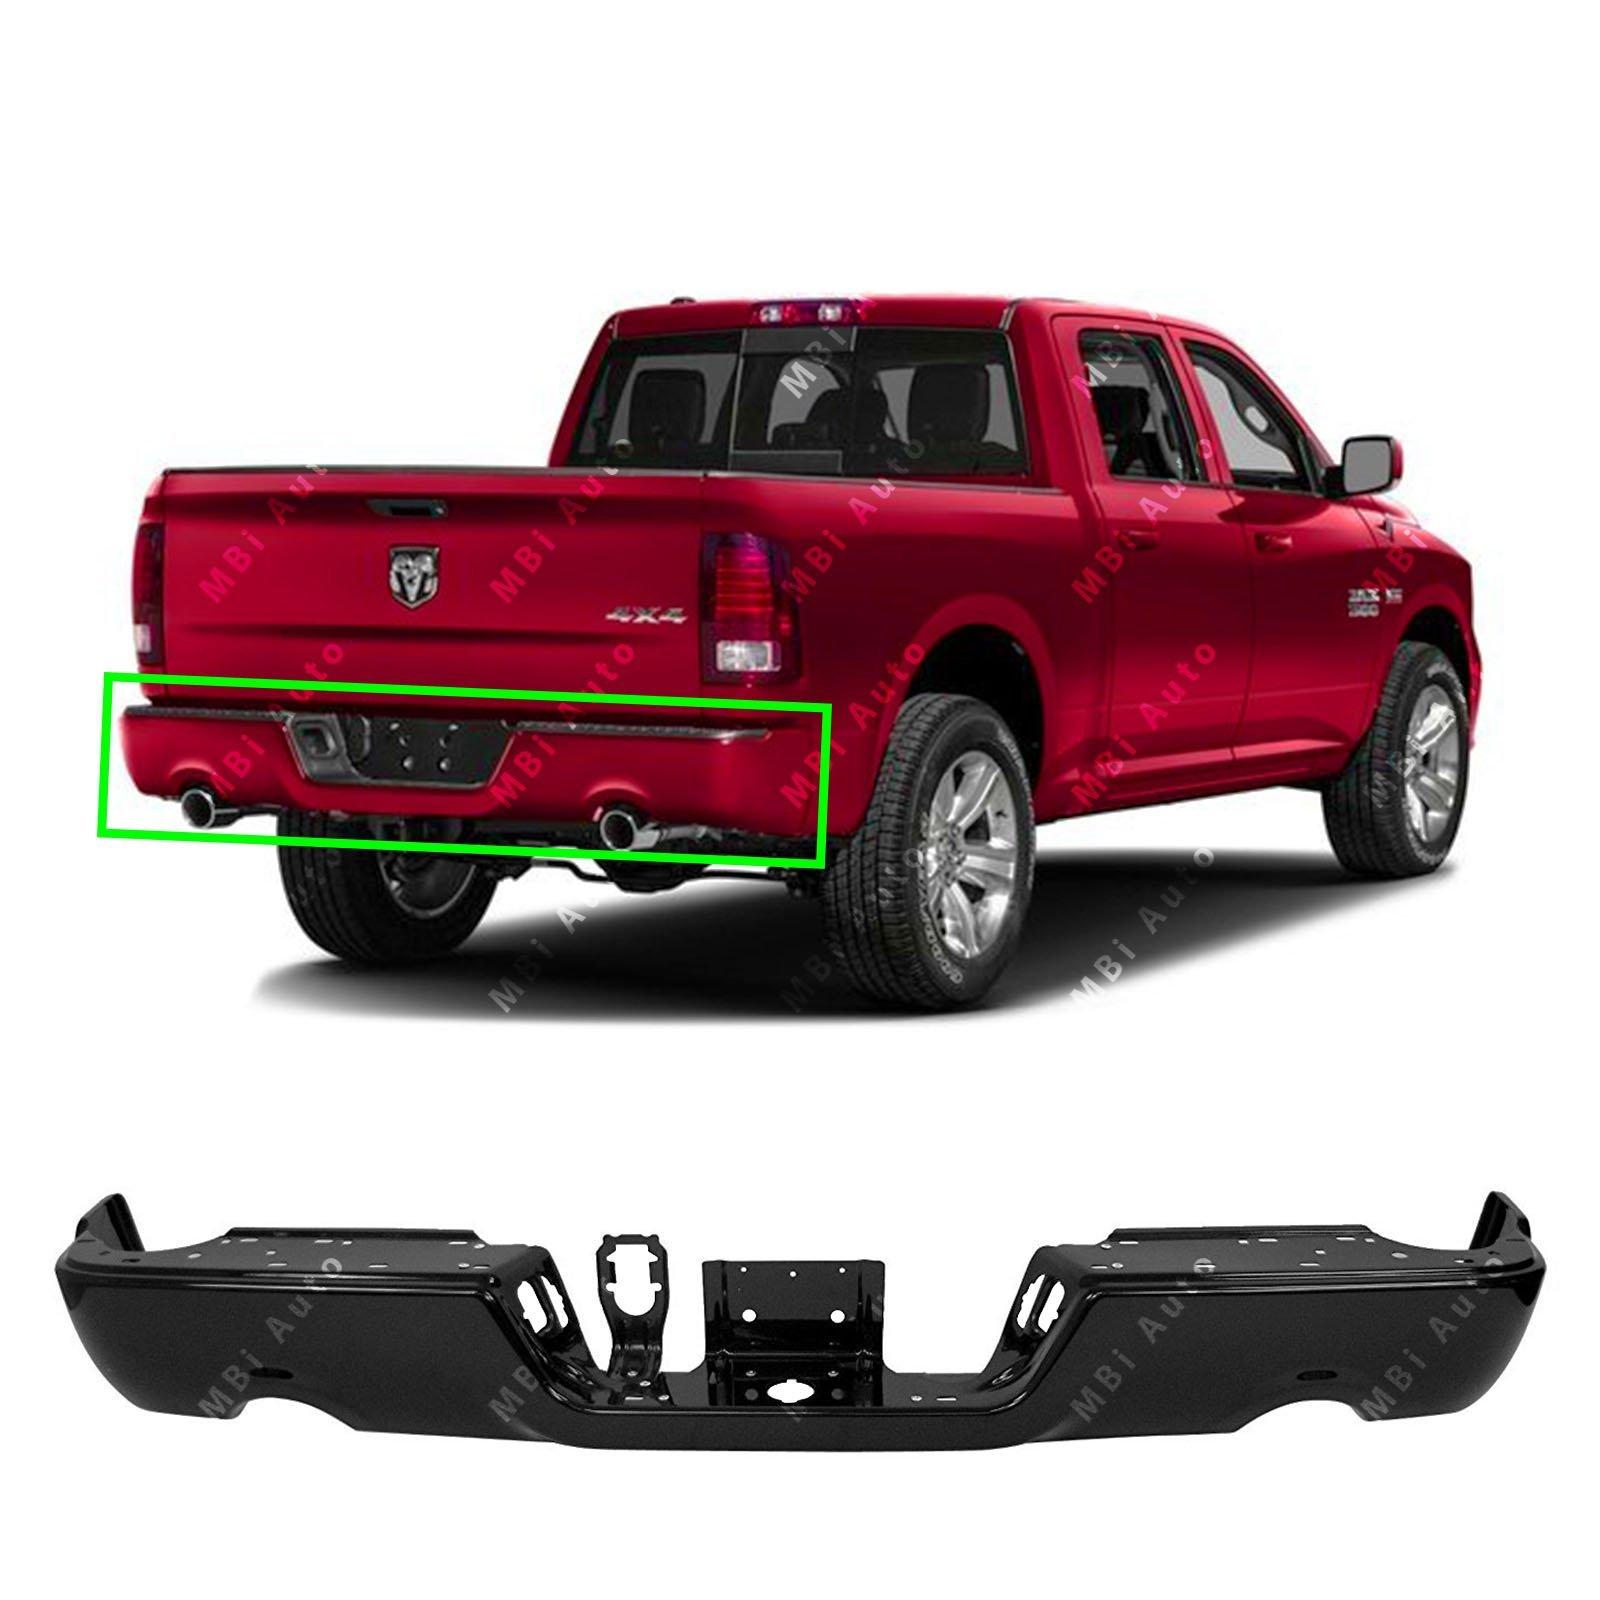 3D MAXpider Hyundai Elantra Sedan 2017-2017 Kagu Rubber Black Front Row L1HY07111509